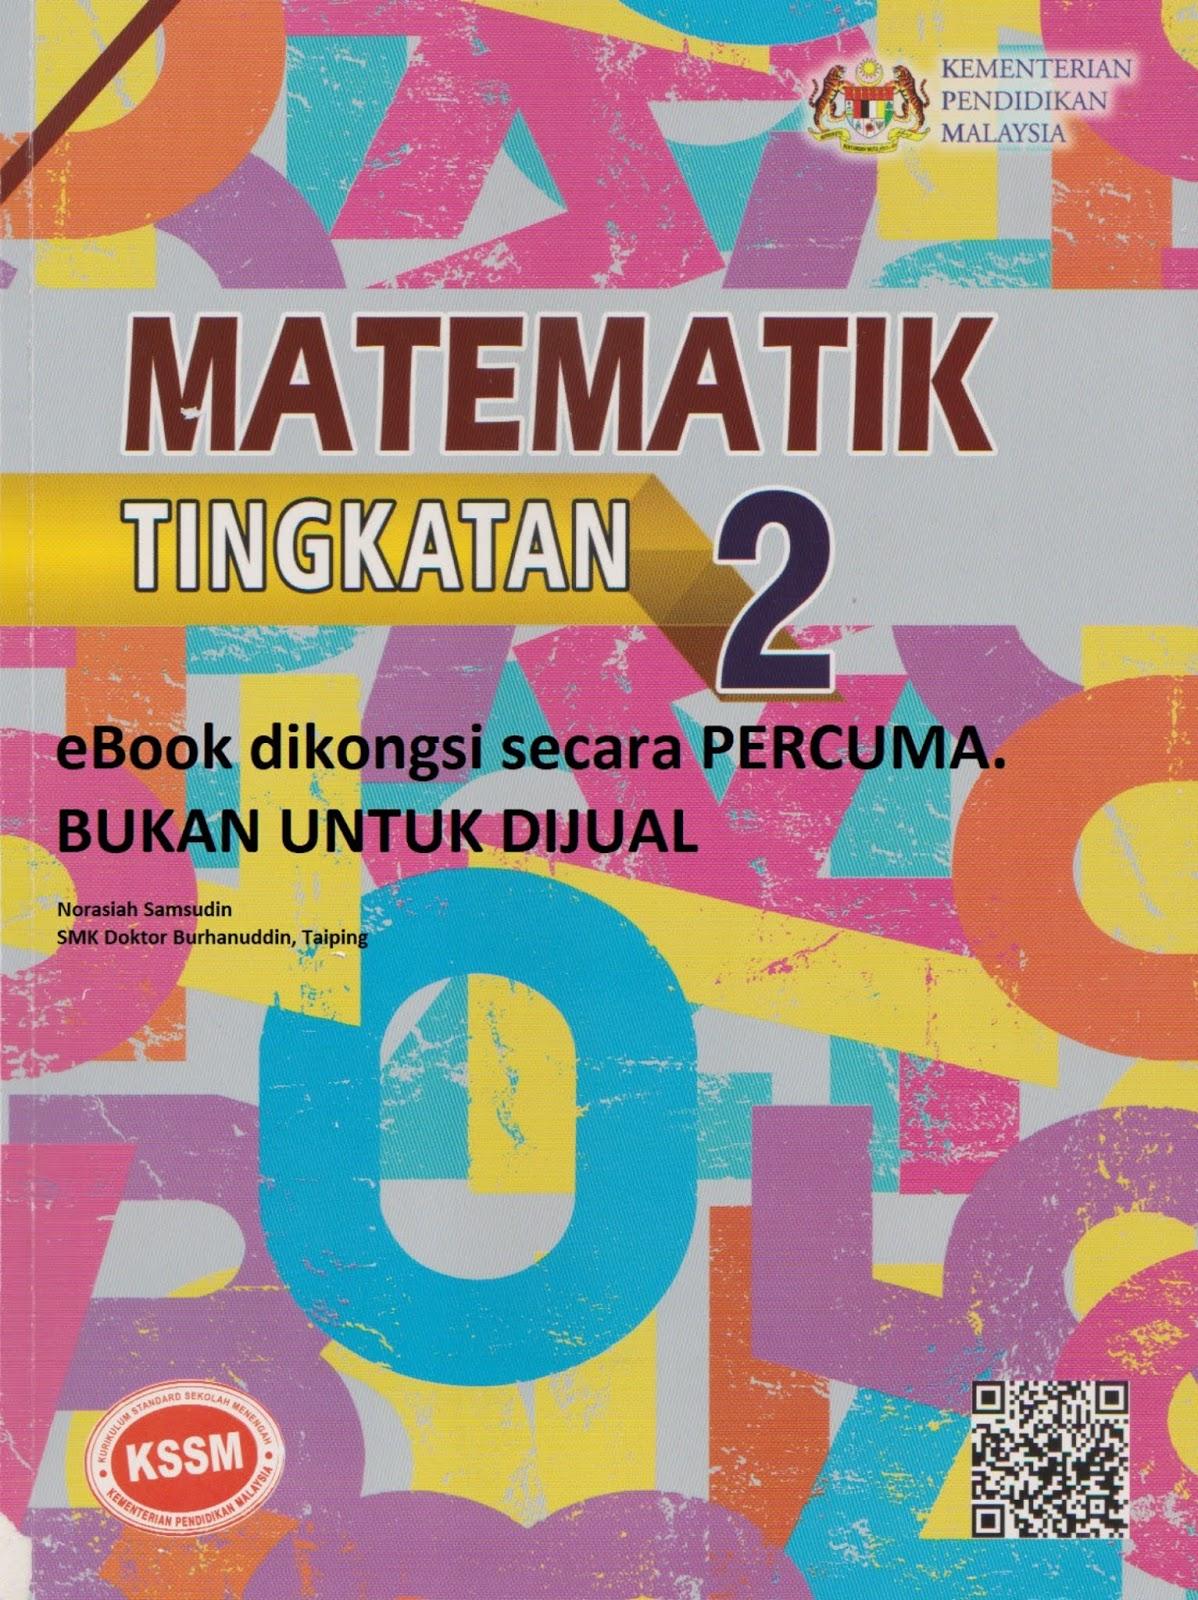 Cikgu Azman - Bukit Jalil: Matematik Tingkatan 2 KSSM ...